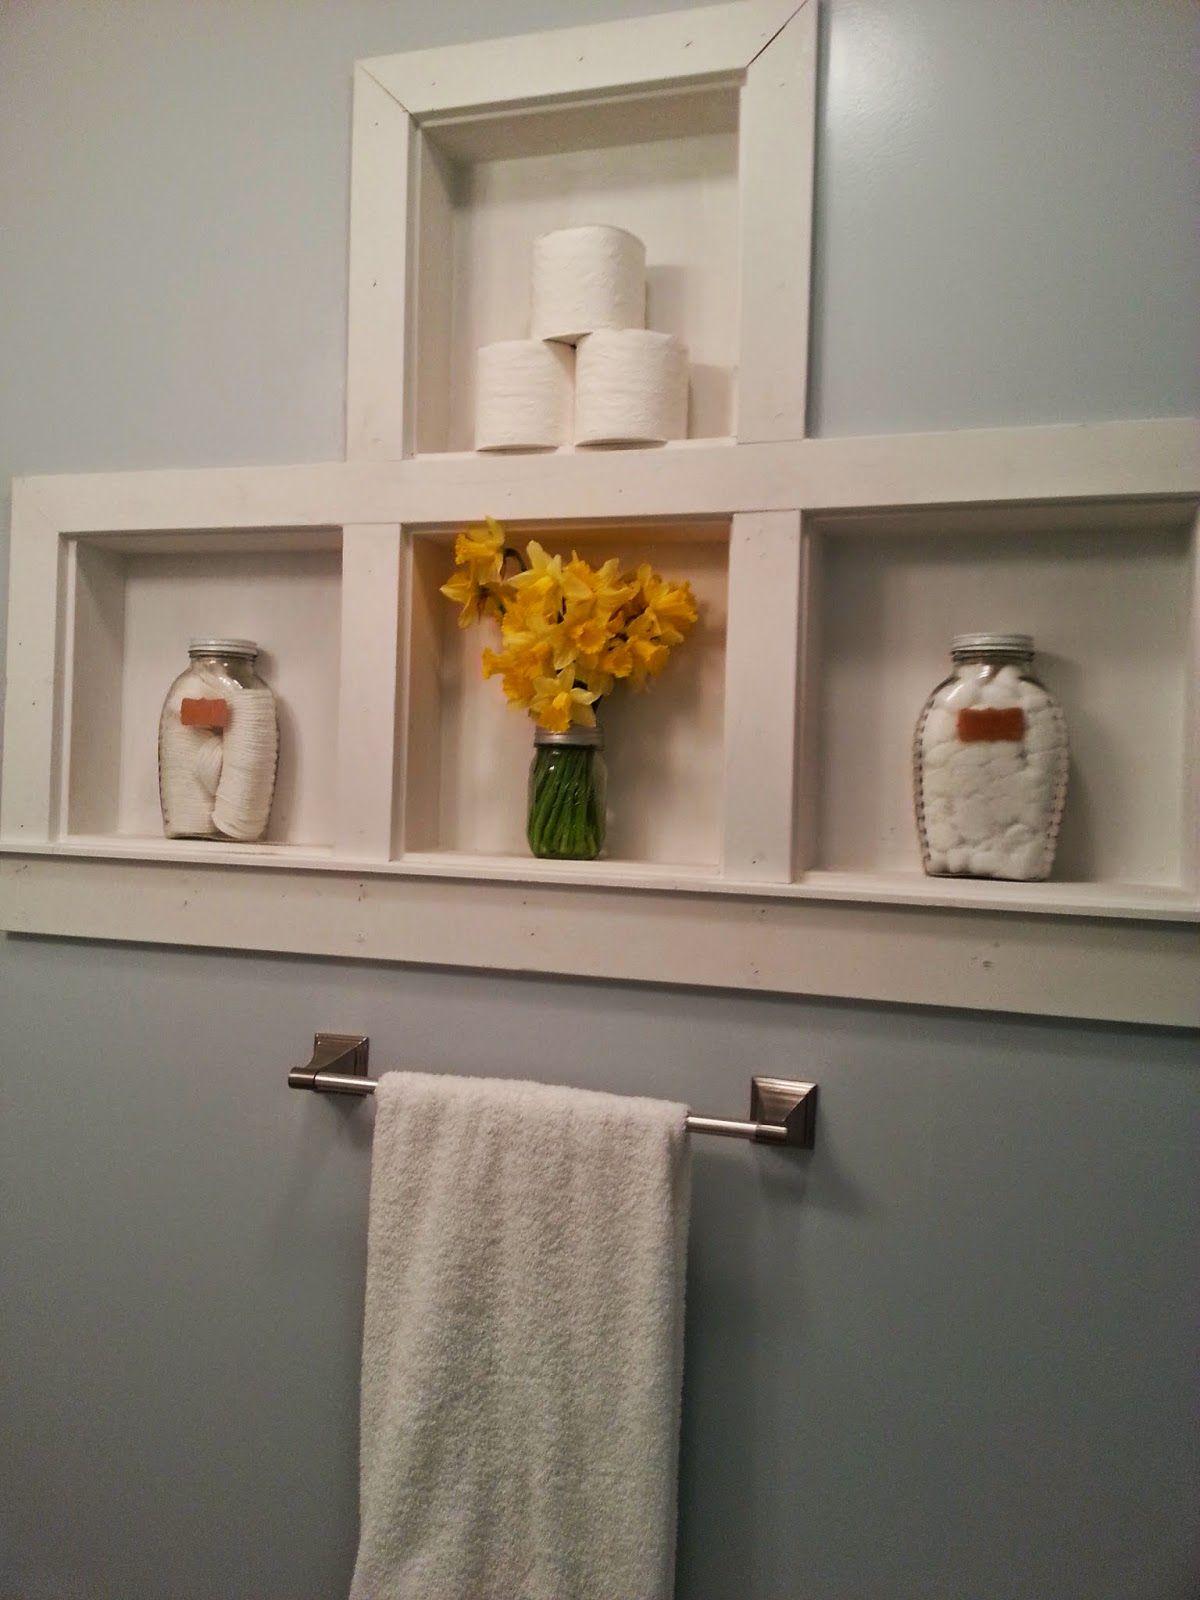 Between The Studs Bathroom Storage Reclaim Renew